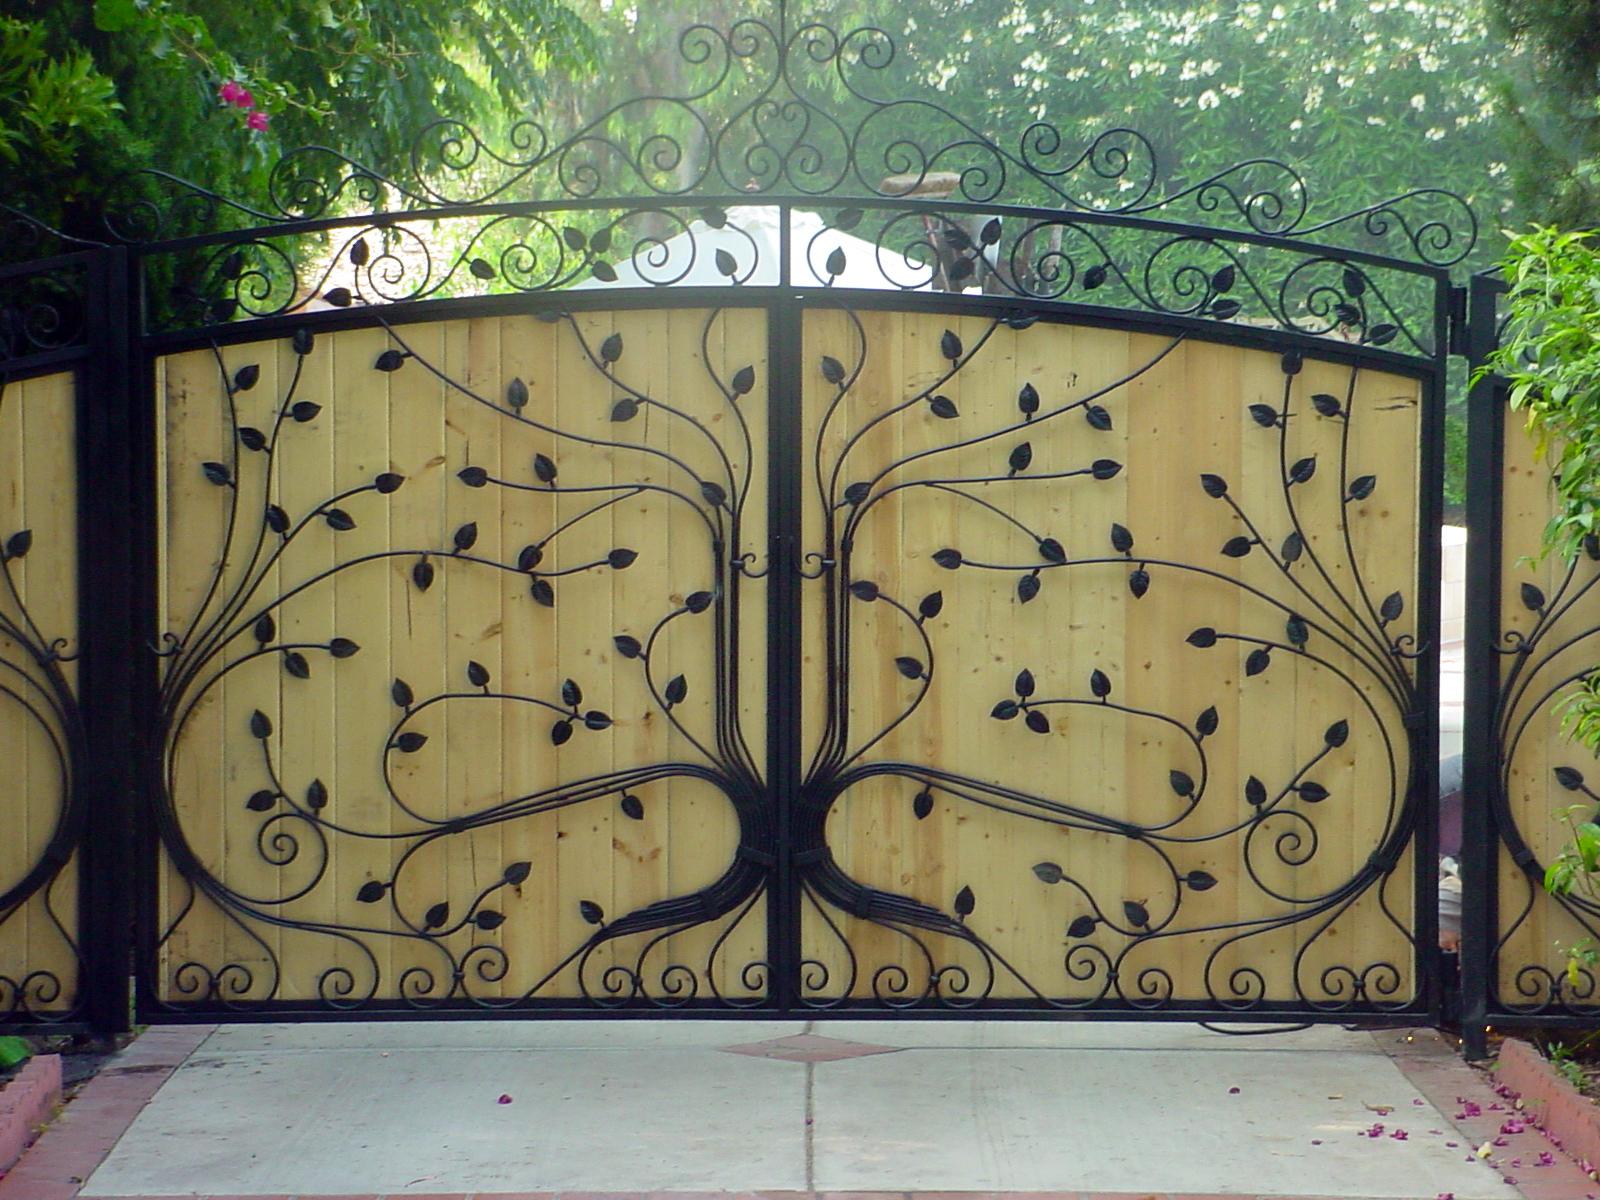 1200 #426634  Iron Gates Wrought Iron Window Guards Wrought Iron Doors image Iron Gate Doors 6531600